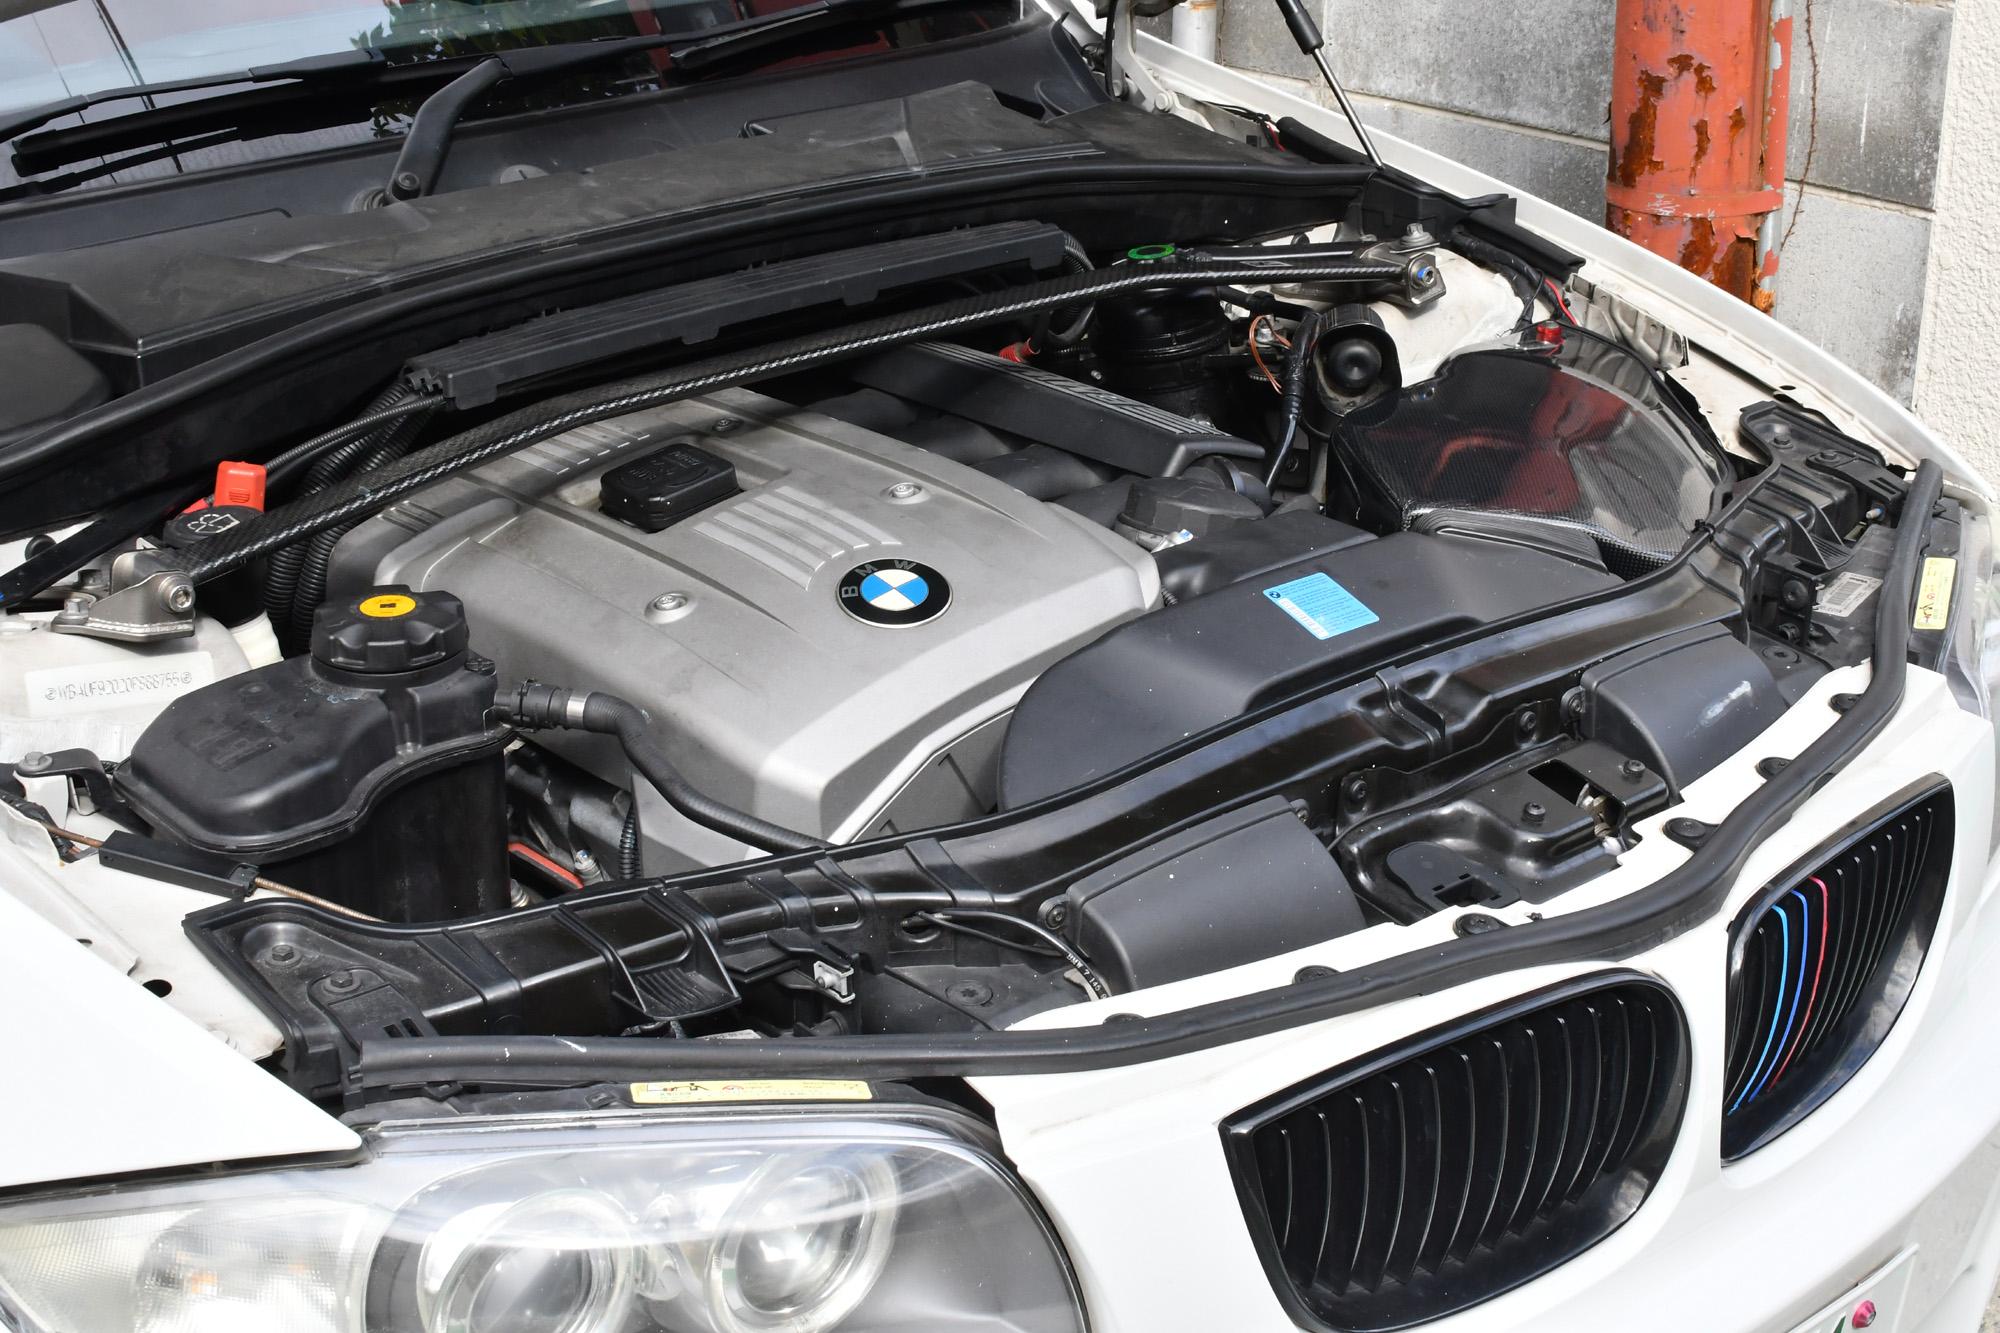 BMW 130i E87 ミッションリンケージ交換と車検